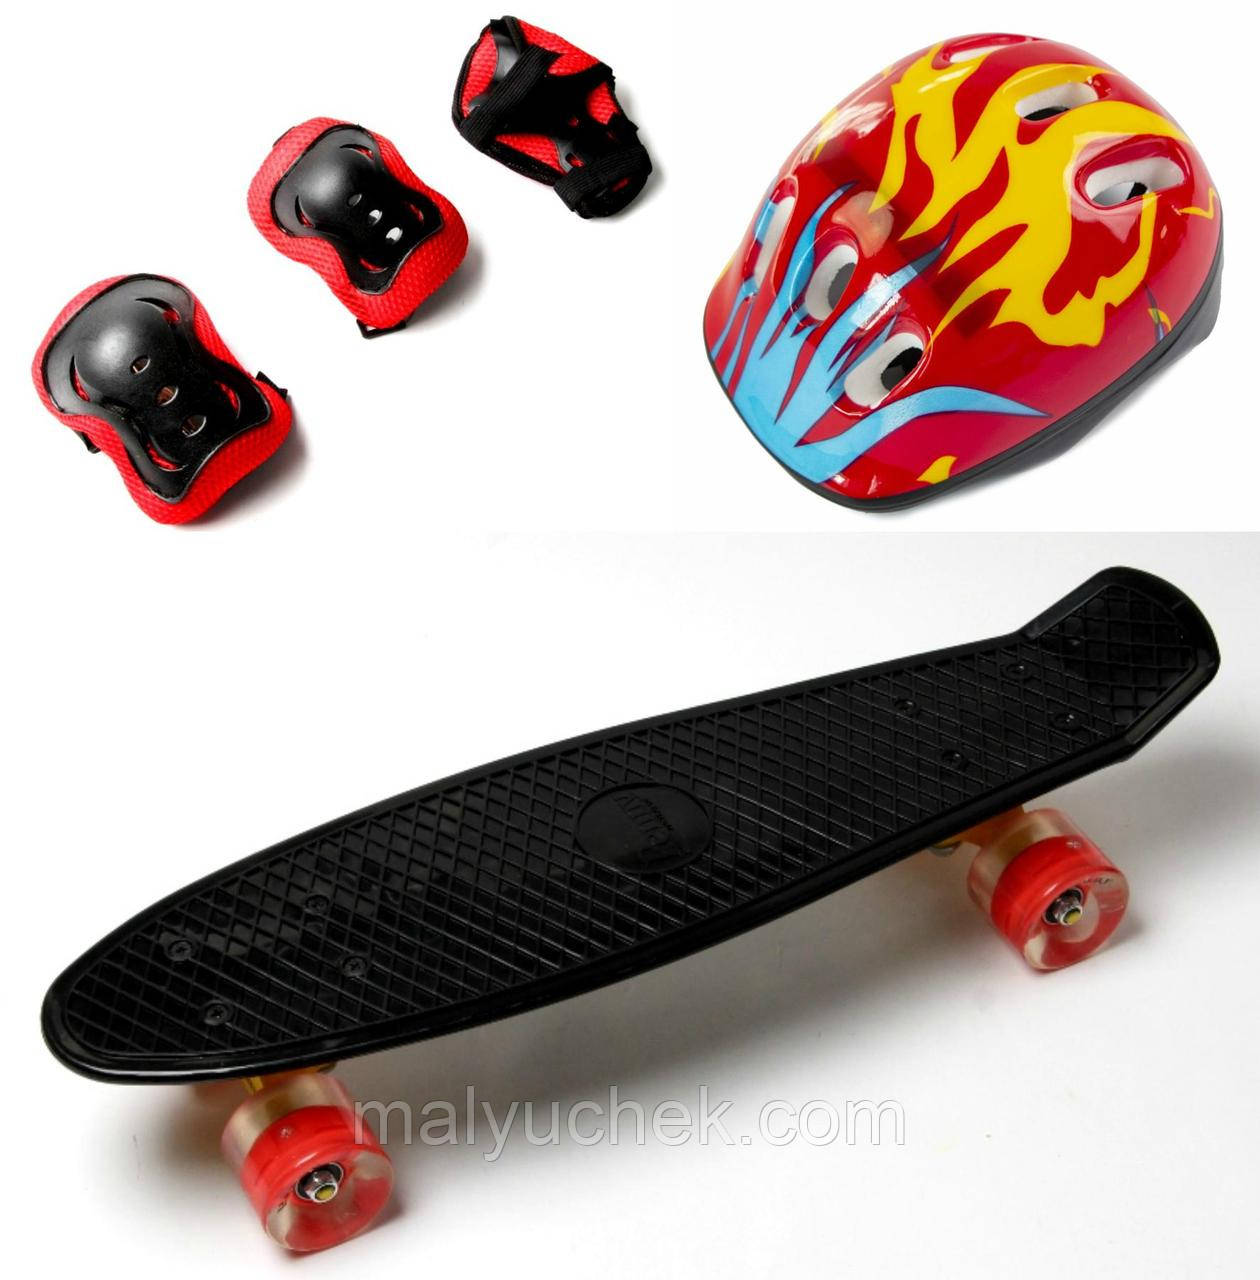 Penny Board. Black.+защита+шлем. Светящиеся колеса.